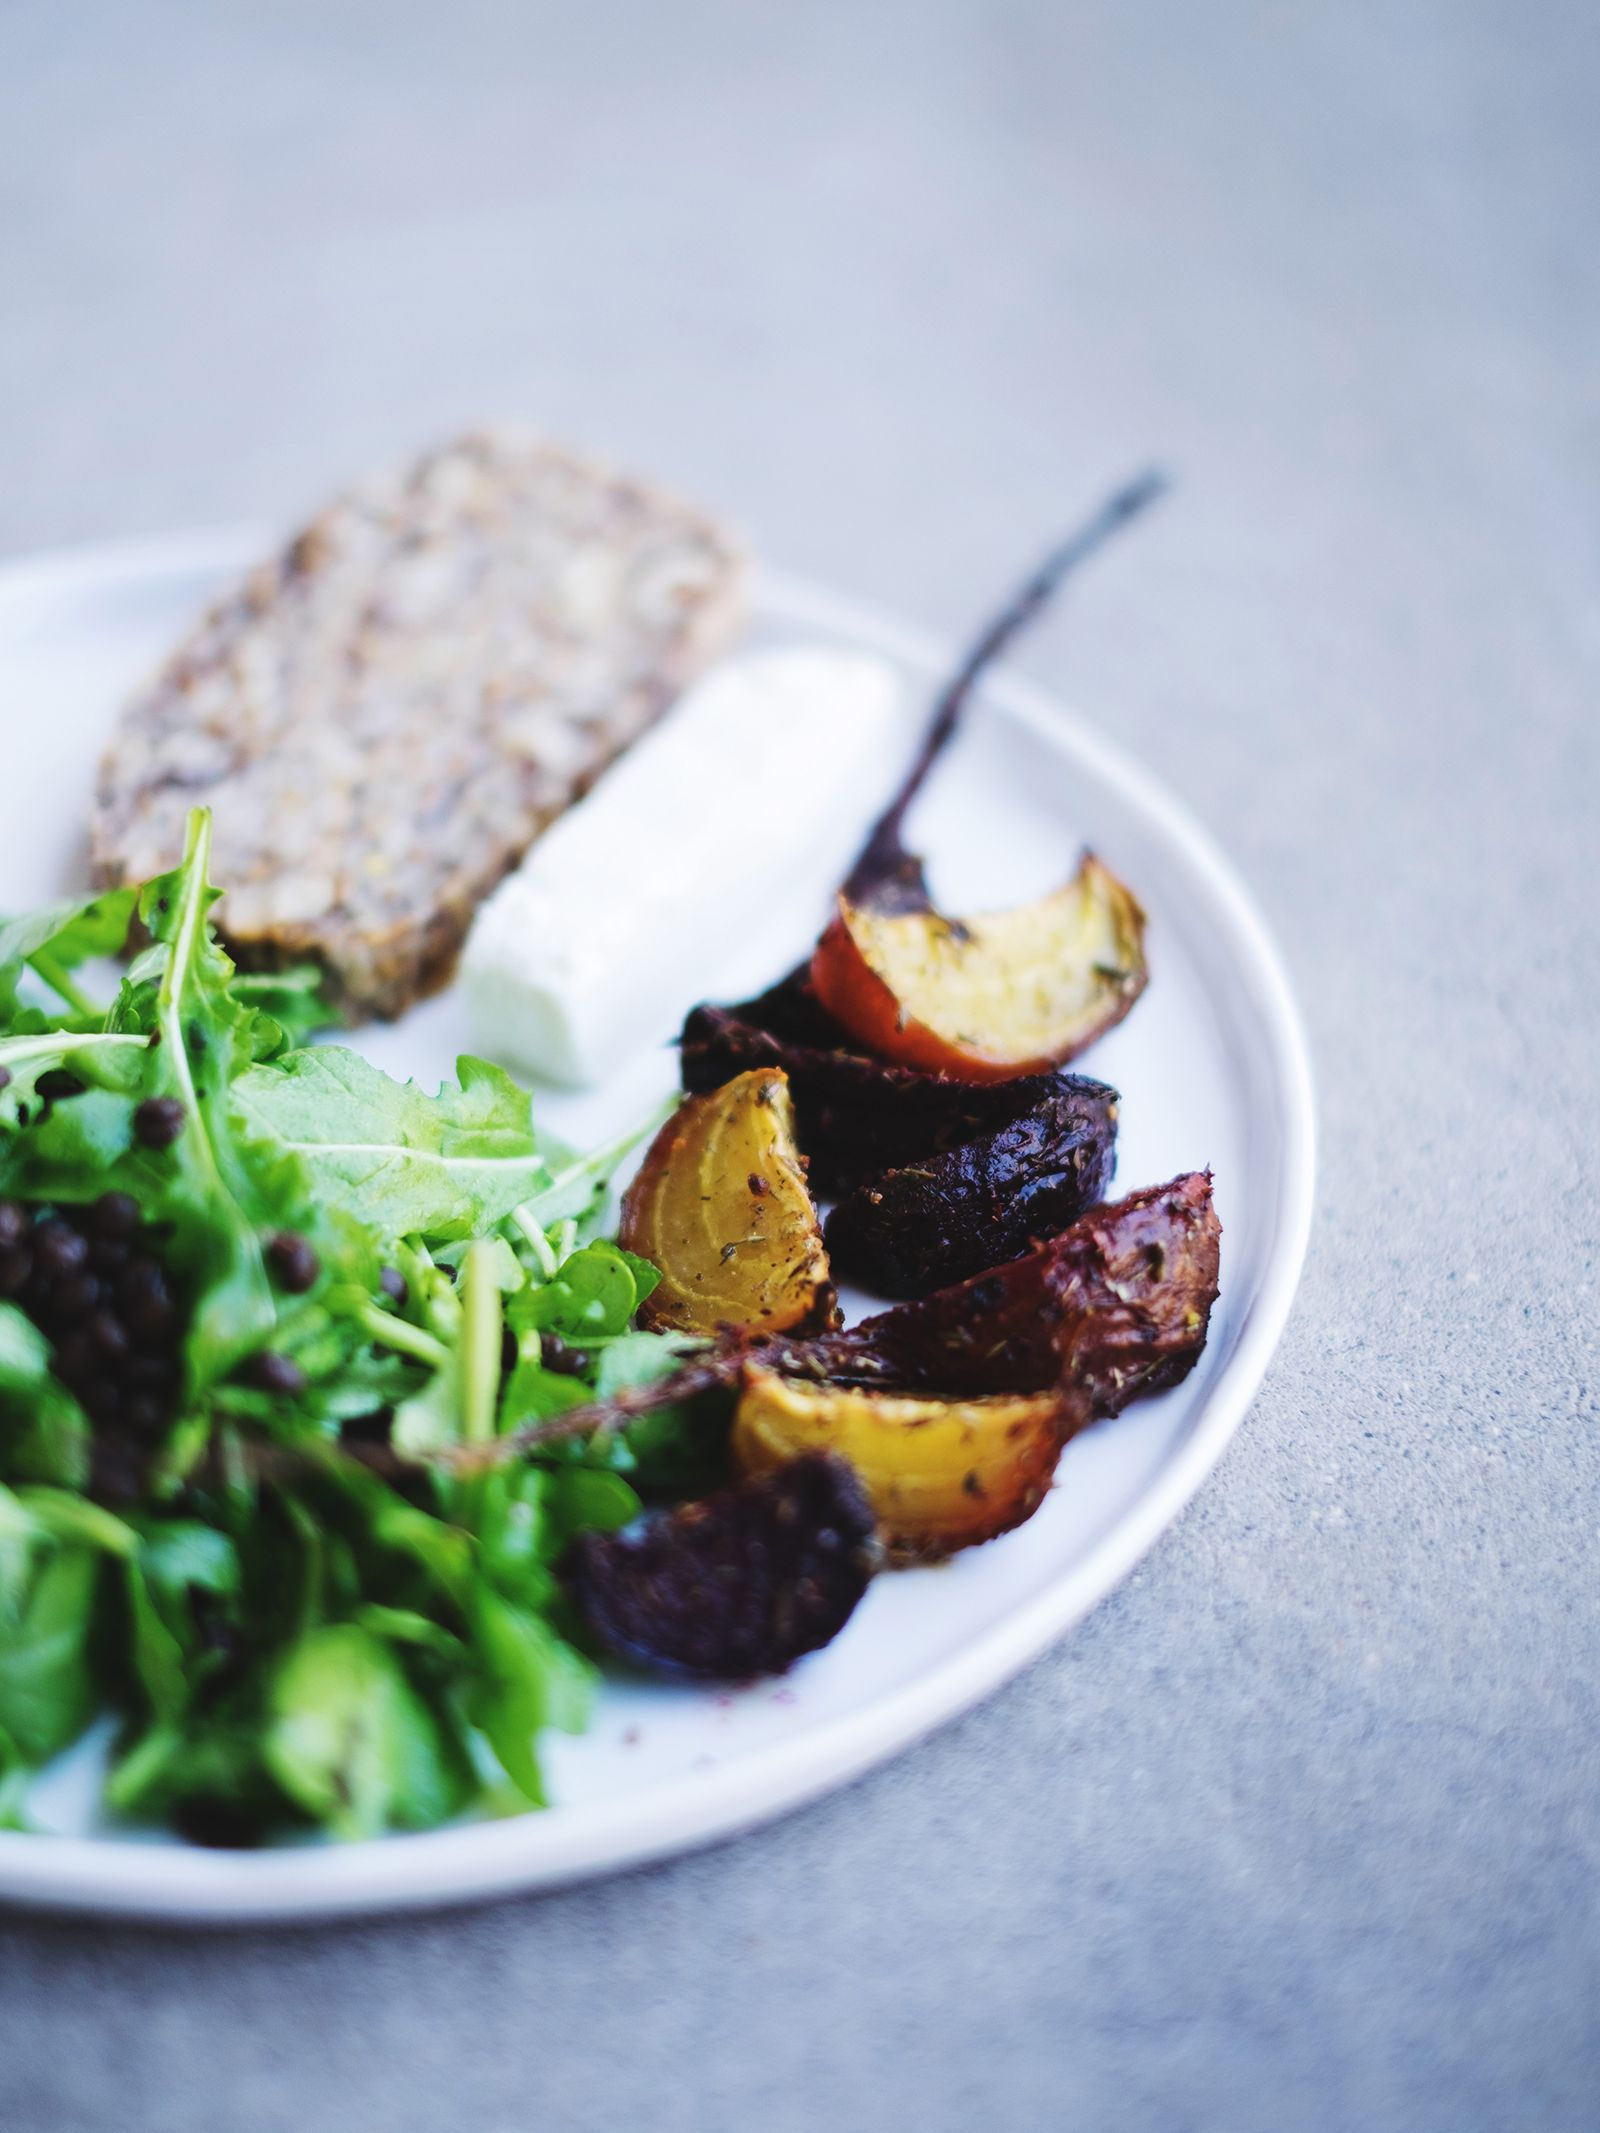 Sweet Kabocha · Lunch w/ Rawspicebar's provencal spices